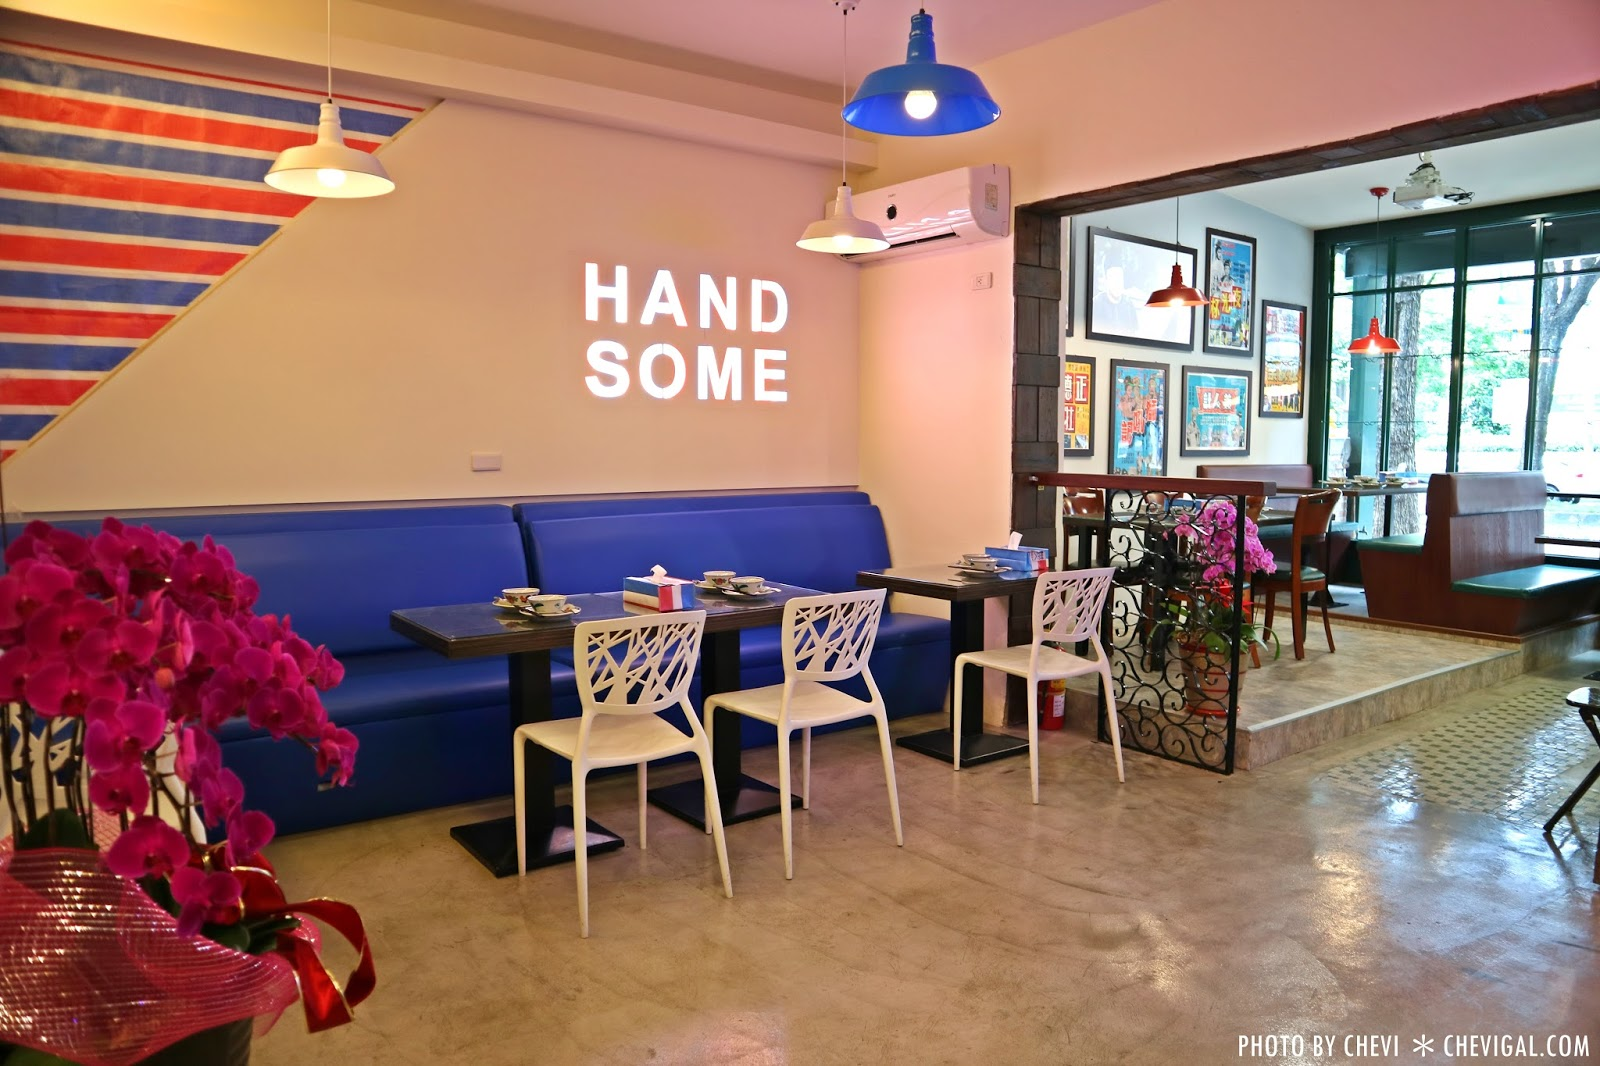 IMG 9115 - 台中西屯│帥鍋冰室*台中第一間香港冰室新開幕。道地港式餐點風味搬來台灣囉